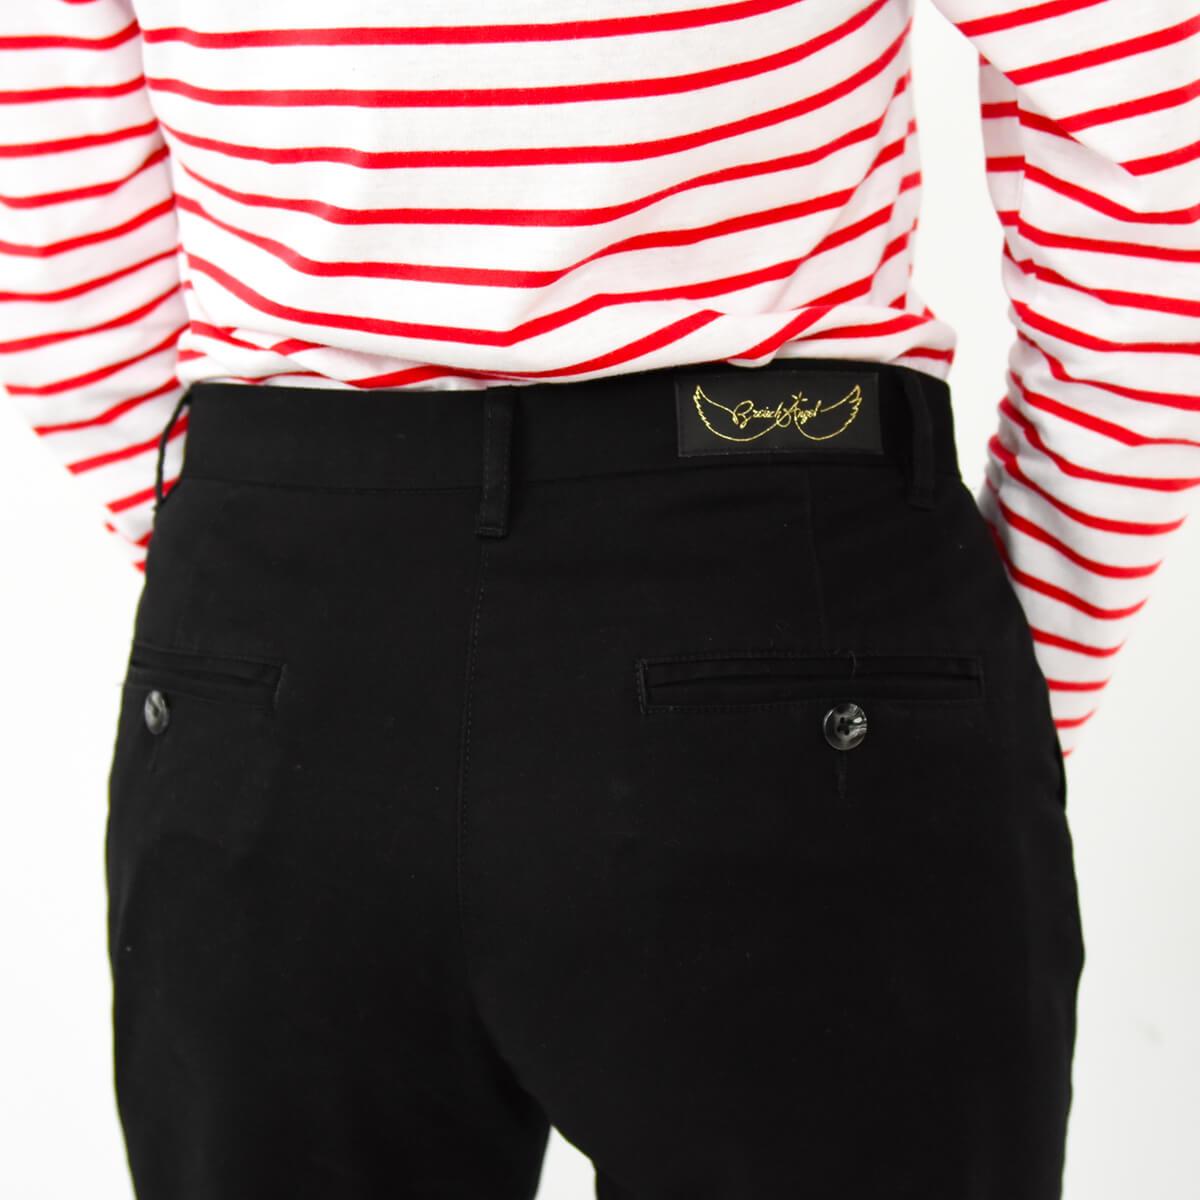 Pantalon chino femme noir zoom dos